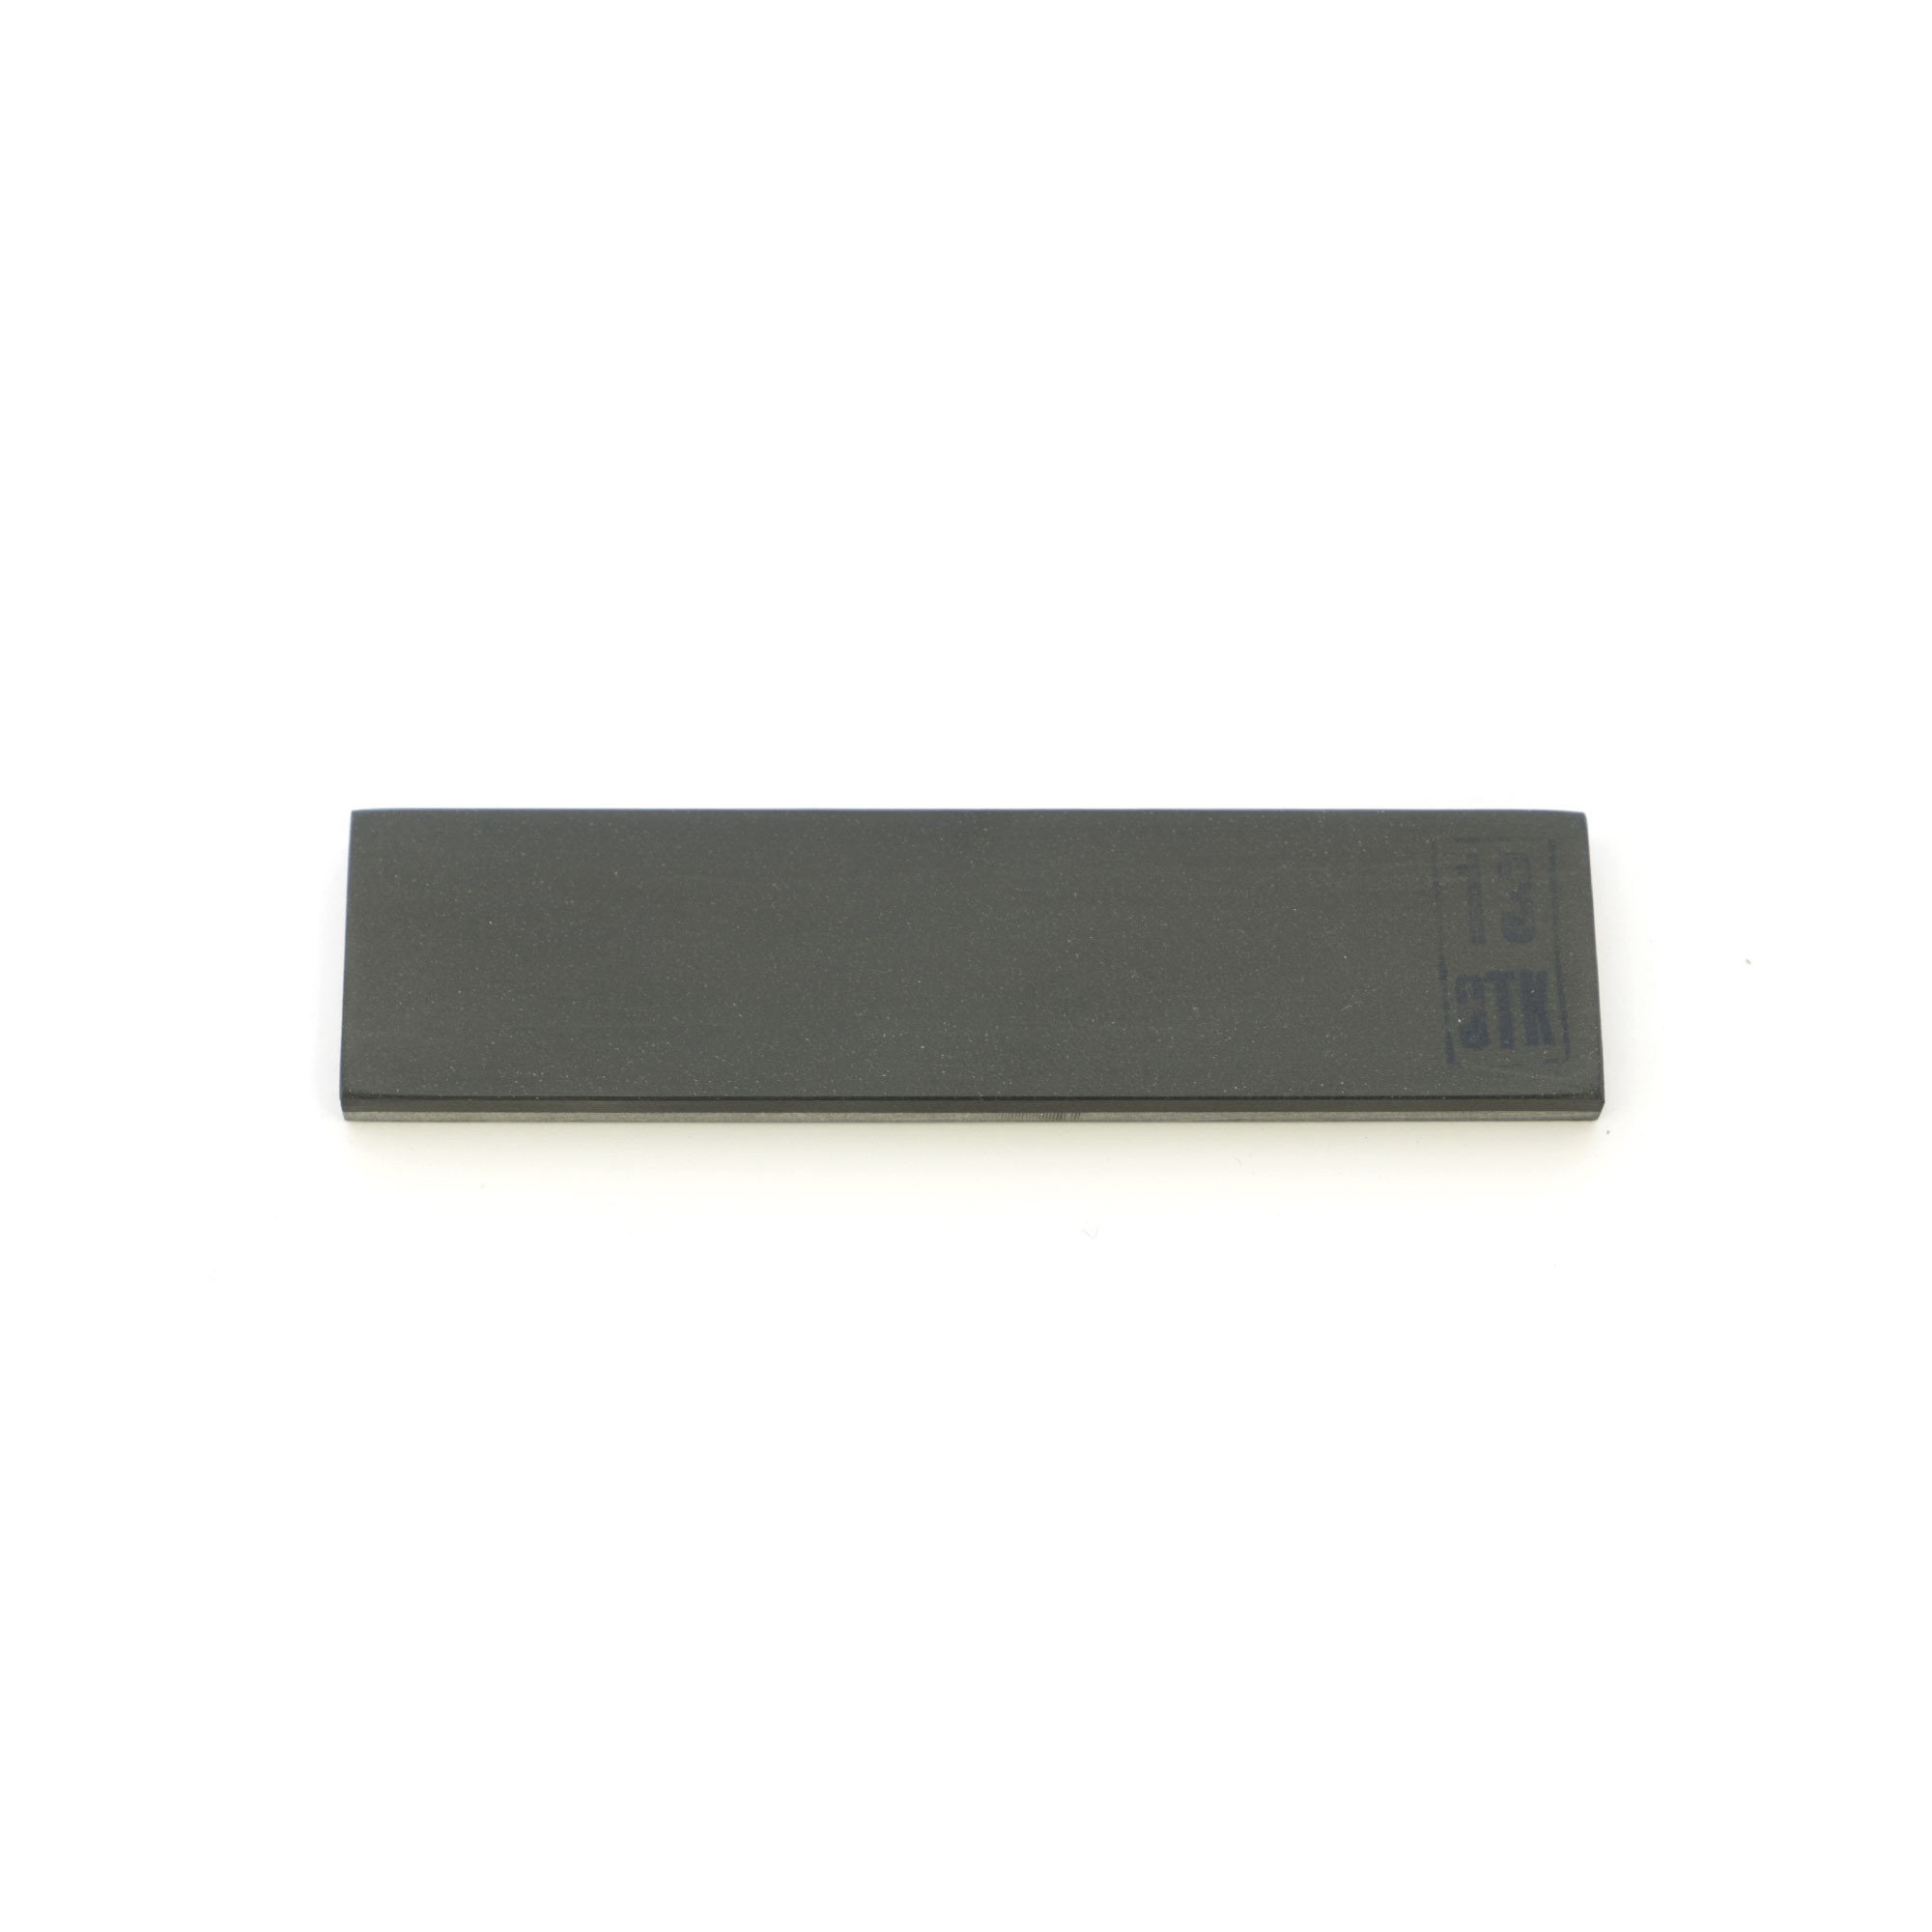 Soft Arkansas Whetstone for KME Gritomatic 4 x 1 x 0.25 American Natural Sharpening Stone of Estimated 600 grit